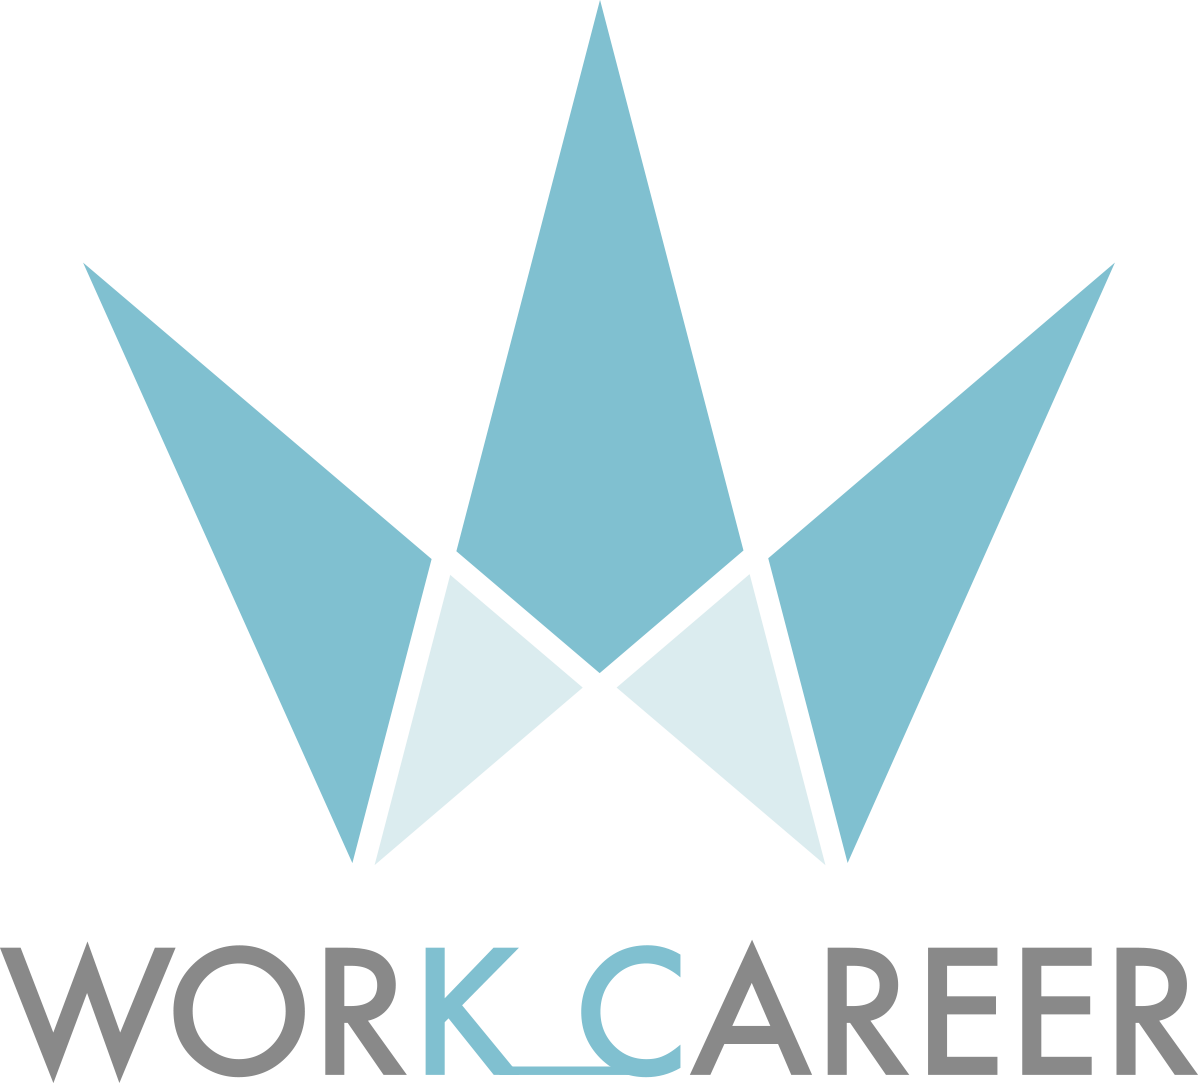 WorkCareer